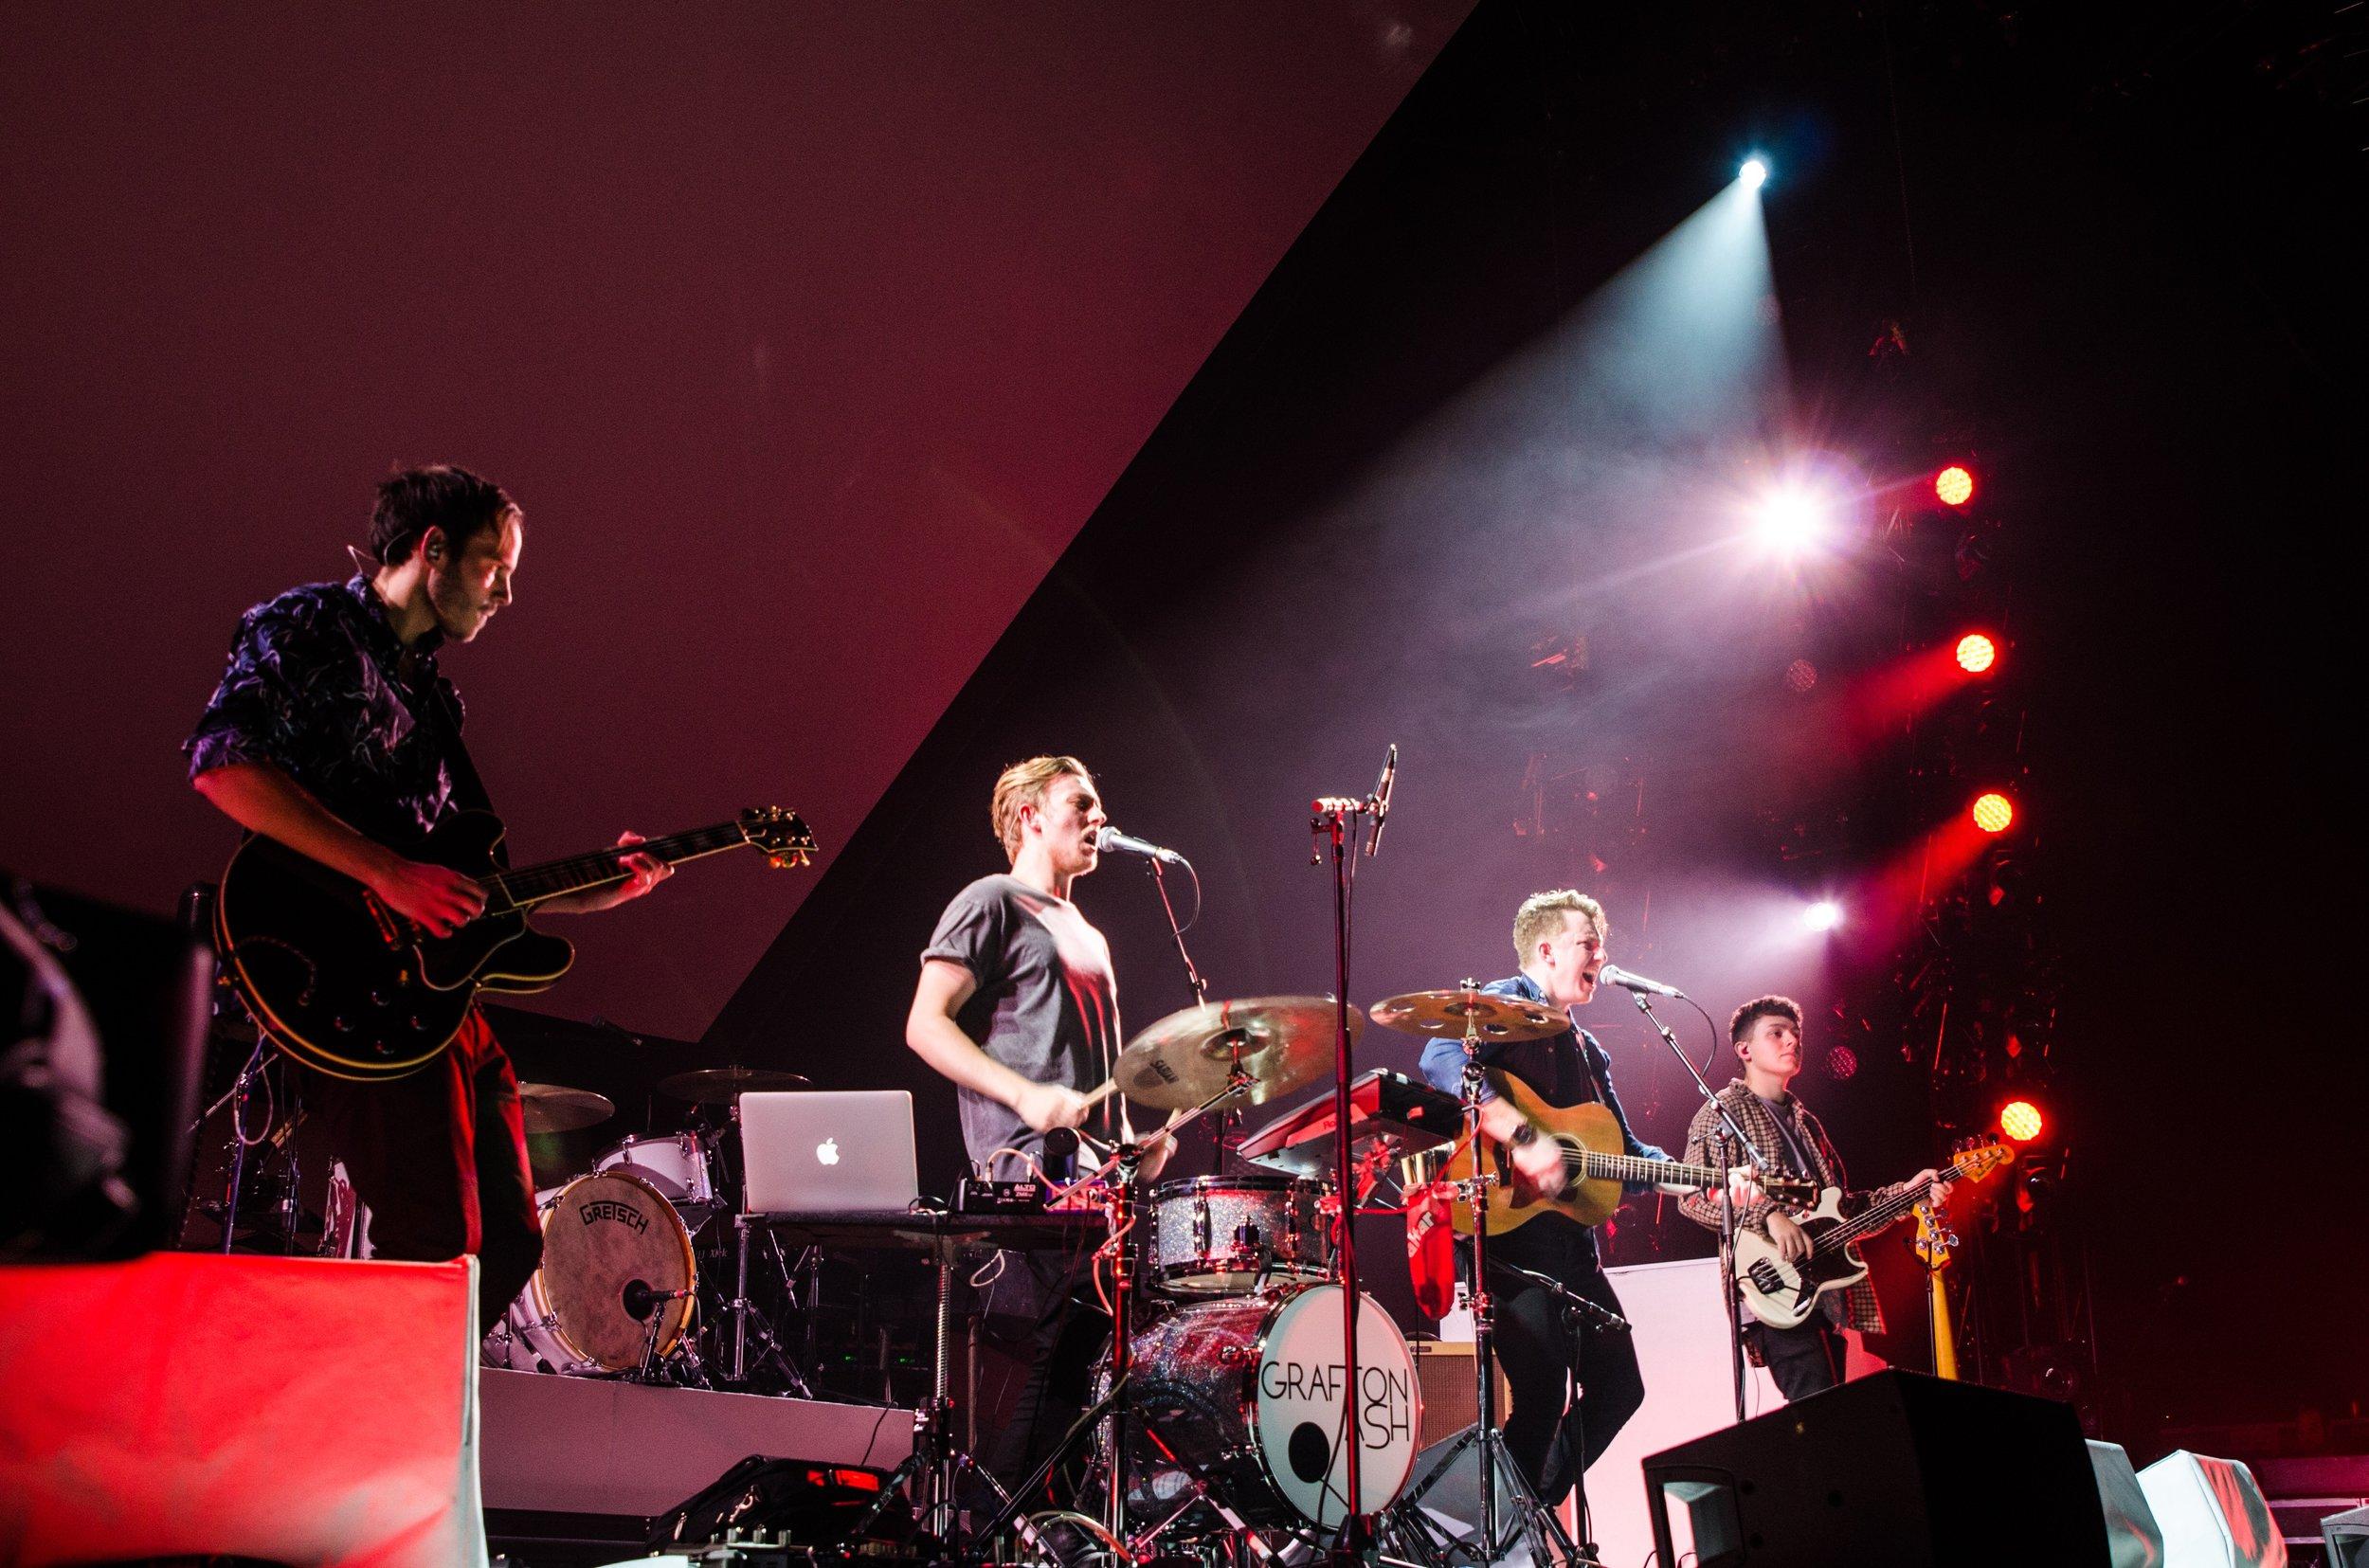 Grafton Ash Live 1.JPG